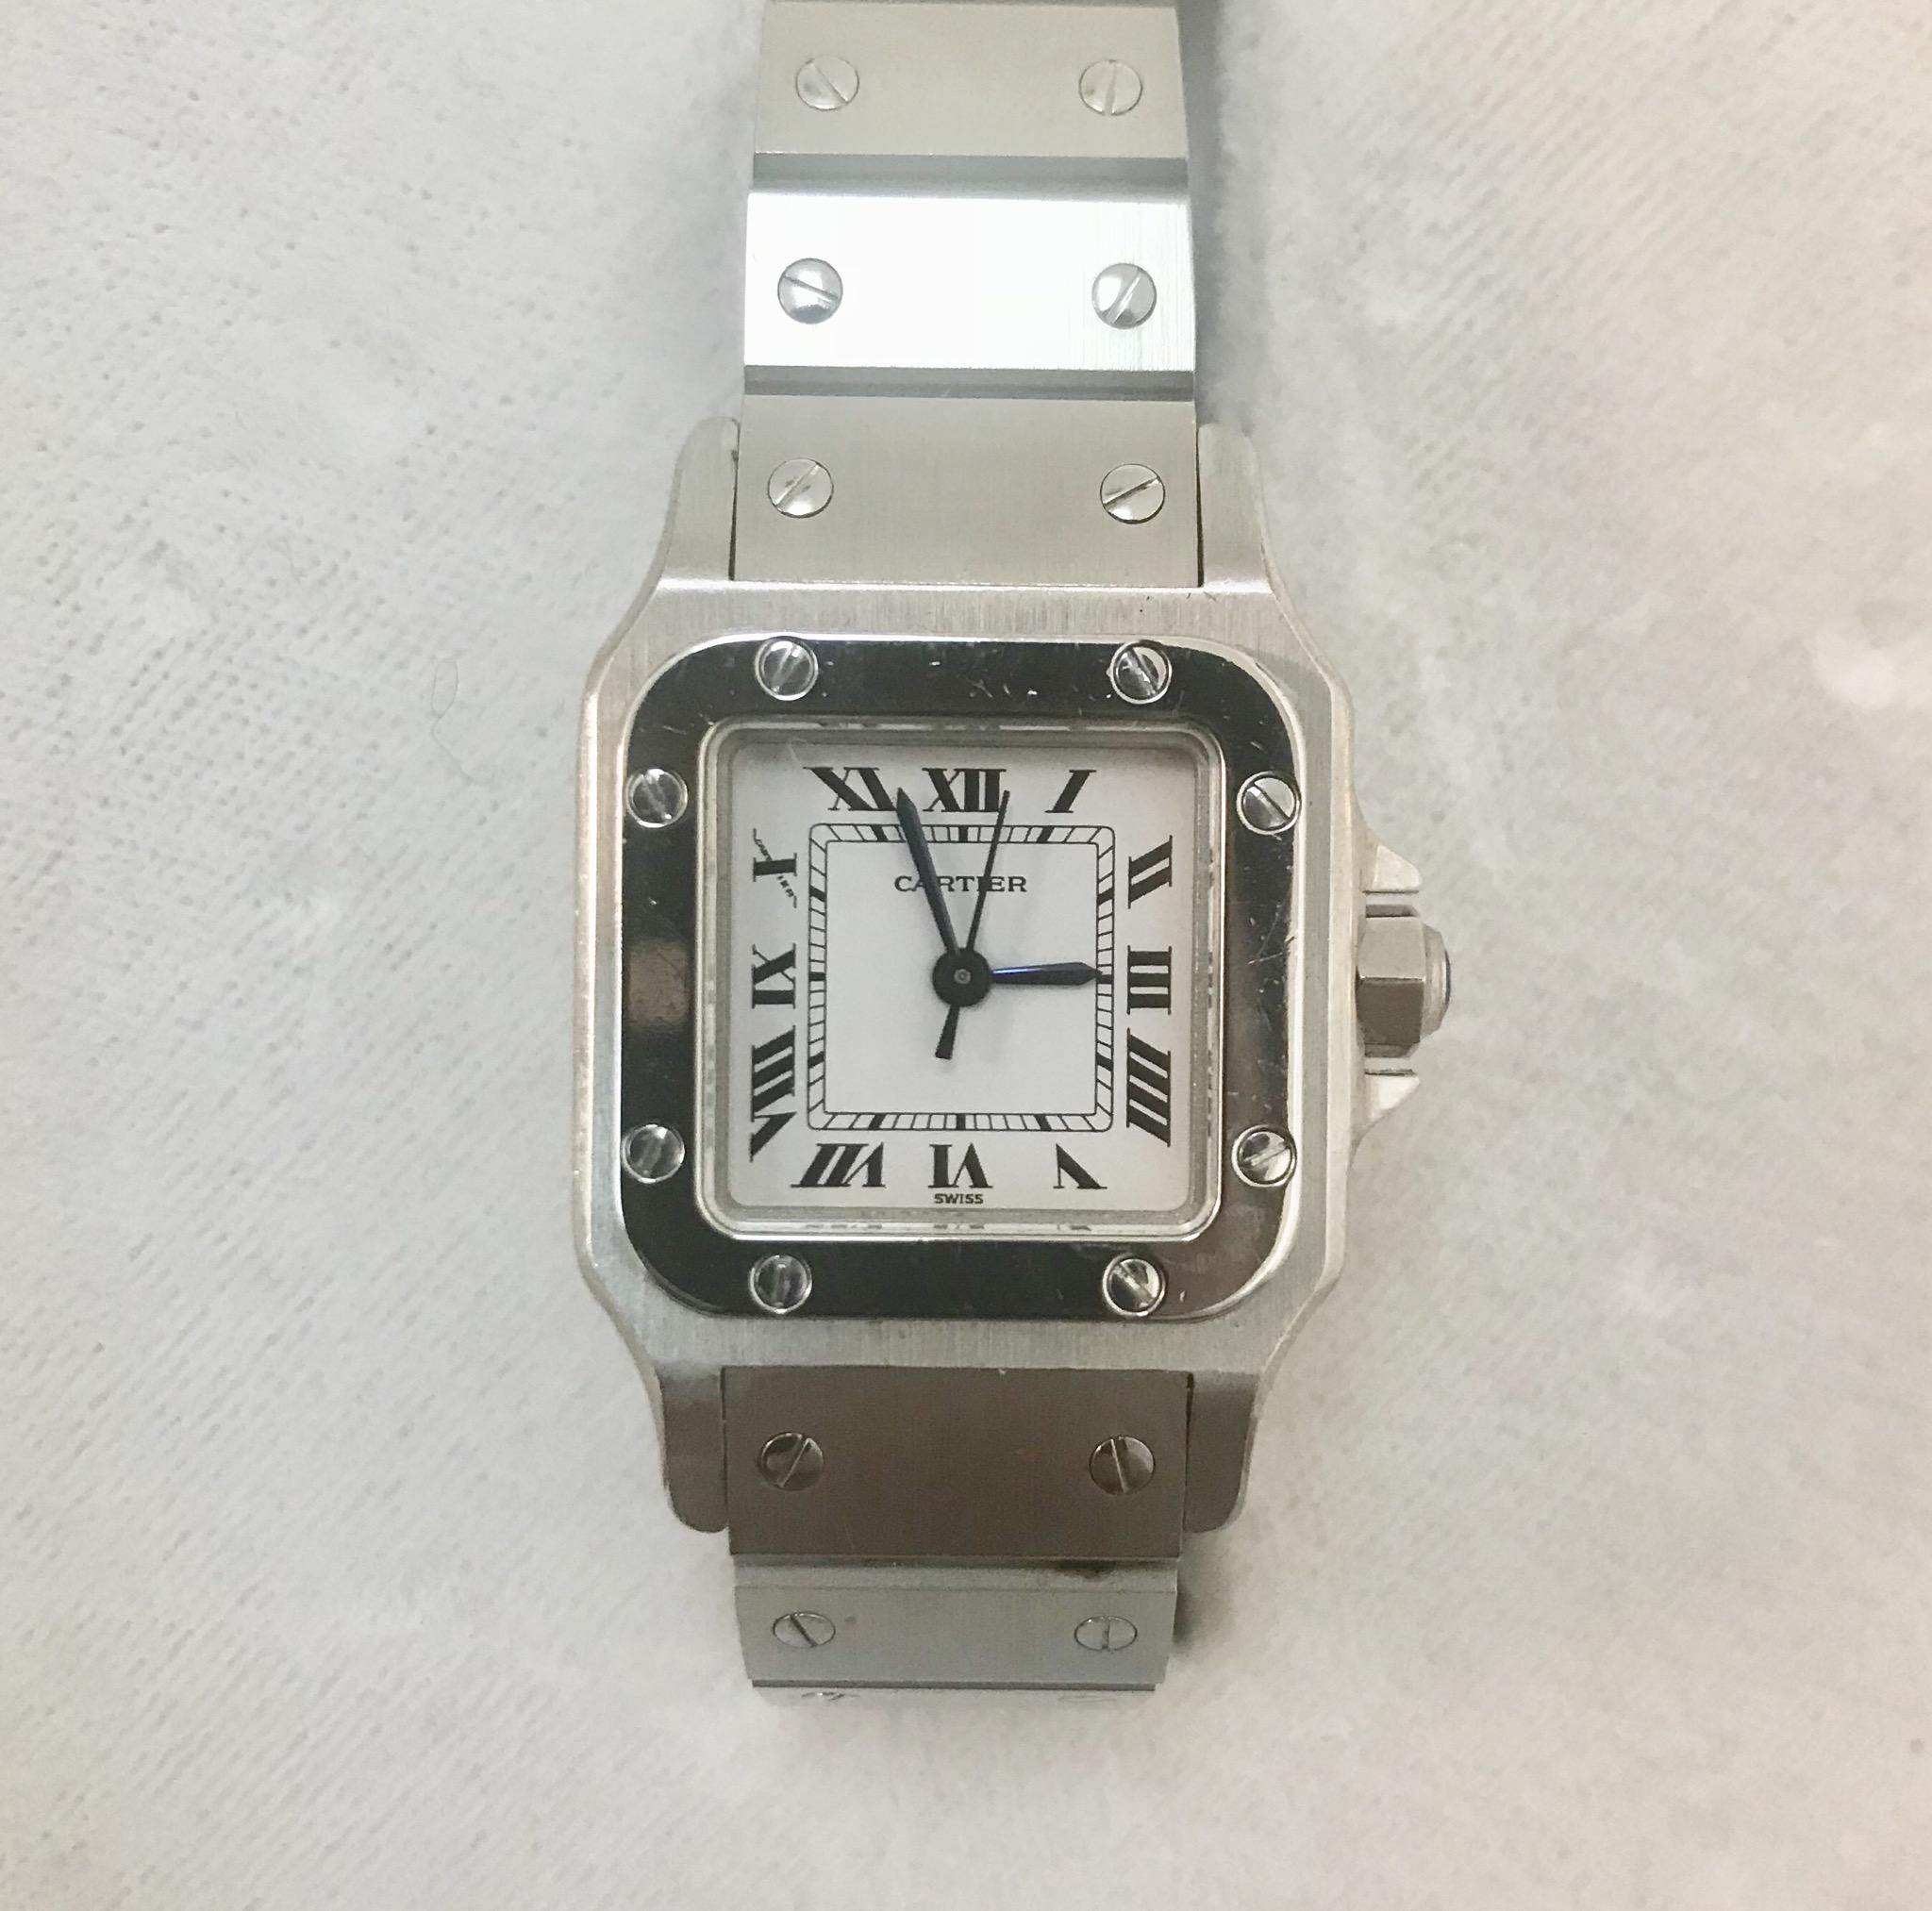 separation shoes 9edb9 3482e カルティエ 腕時計 サントスガルベSM 自動巻の買取価格 - 時計の ...